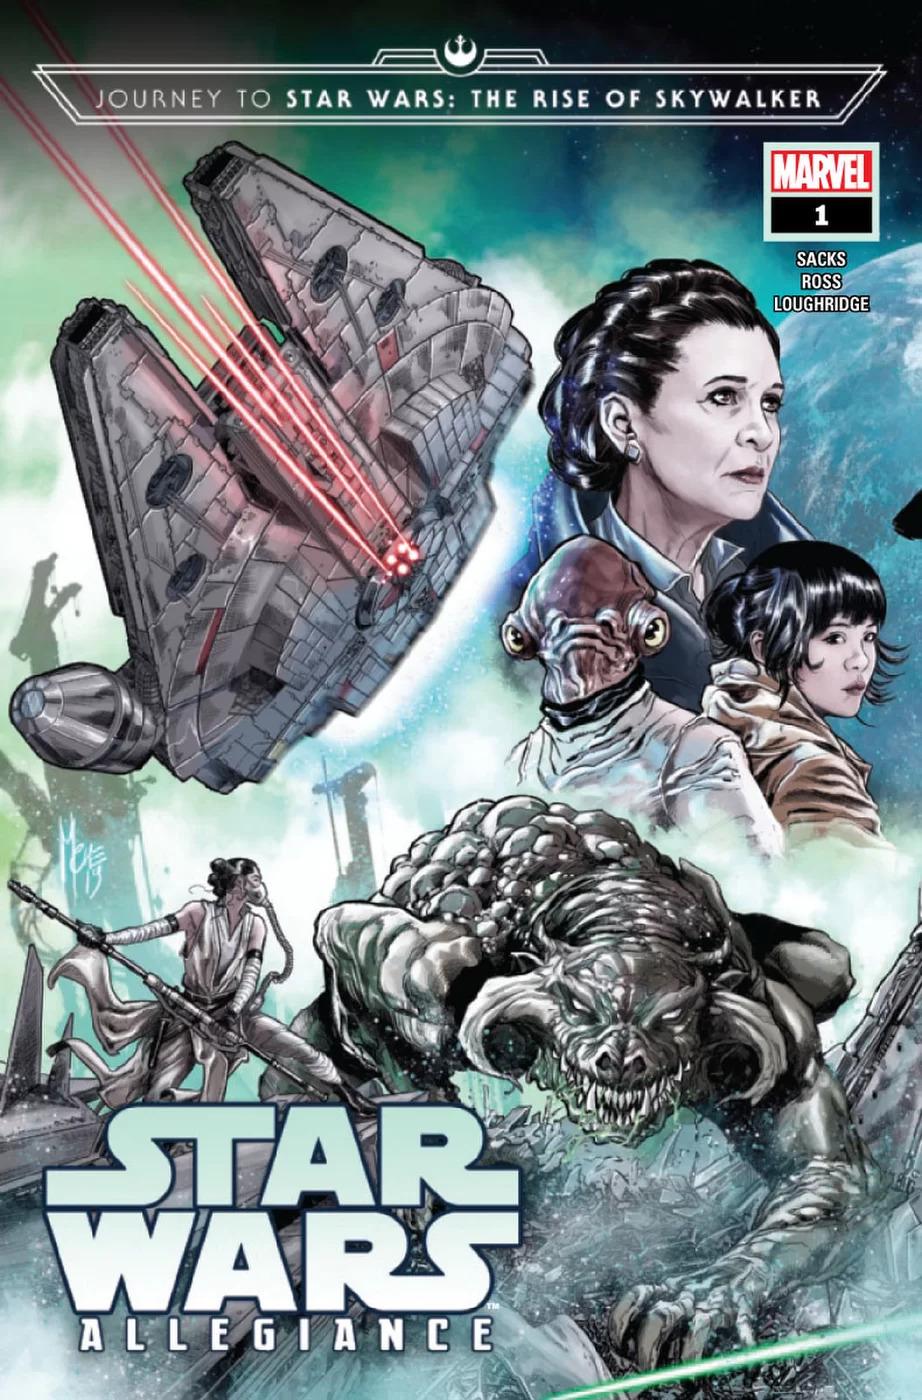 Journey To Star Wars: The Rise of Skywalker - Allegiance #1, copertina di Marco Checchetto